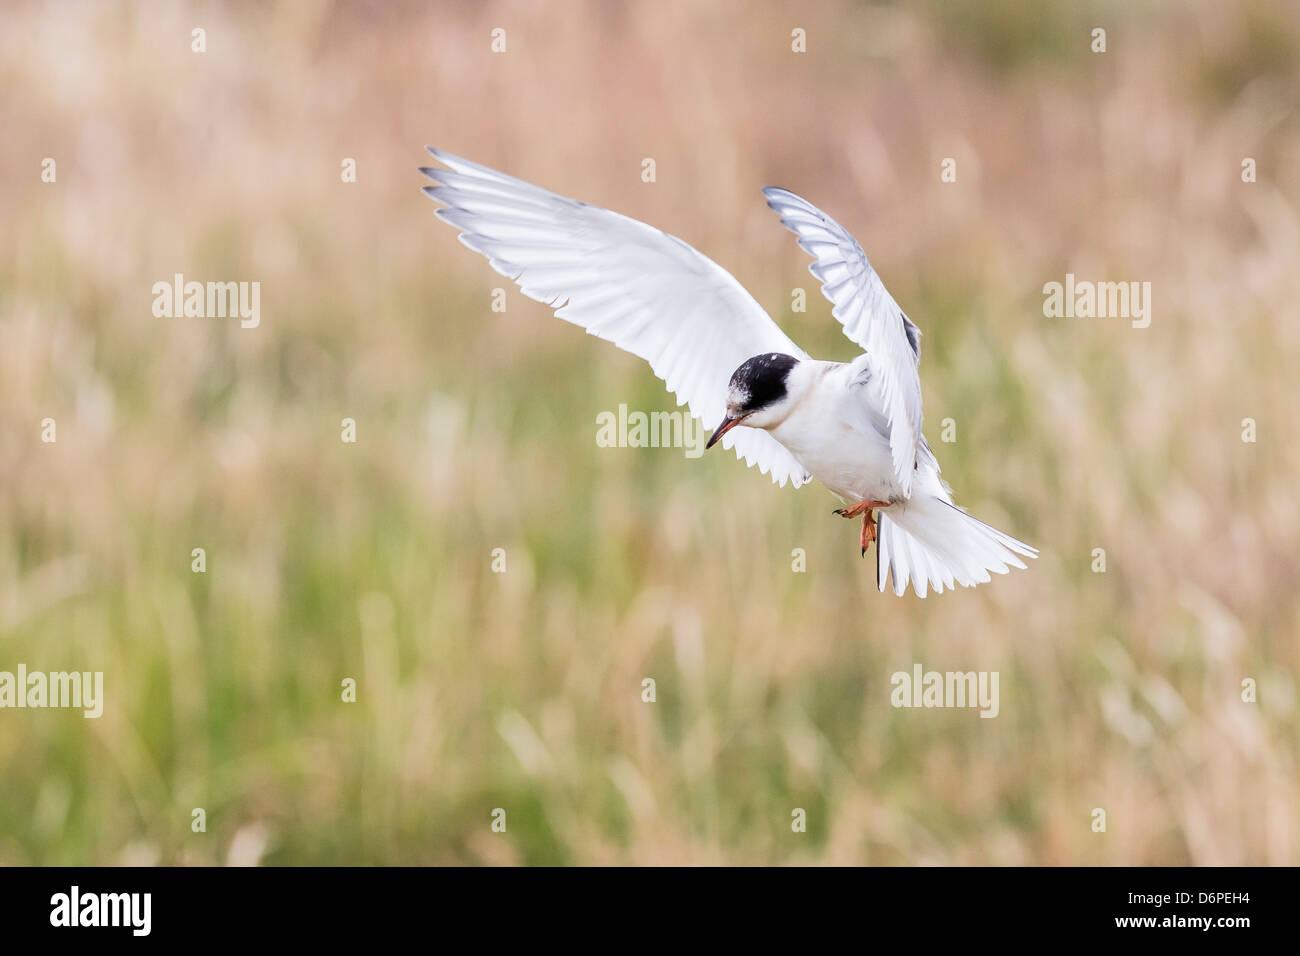 Arctic tern (Sterna paradisaea) chick in flight, Flatey Island, Iceland, Polar Regions - Stock Image